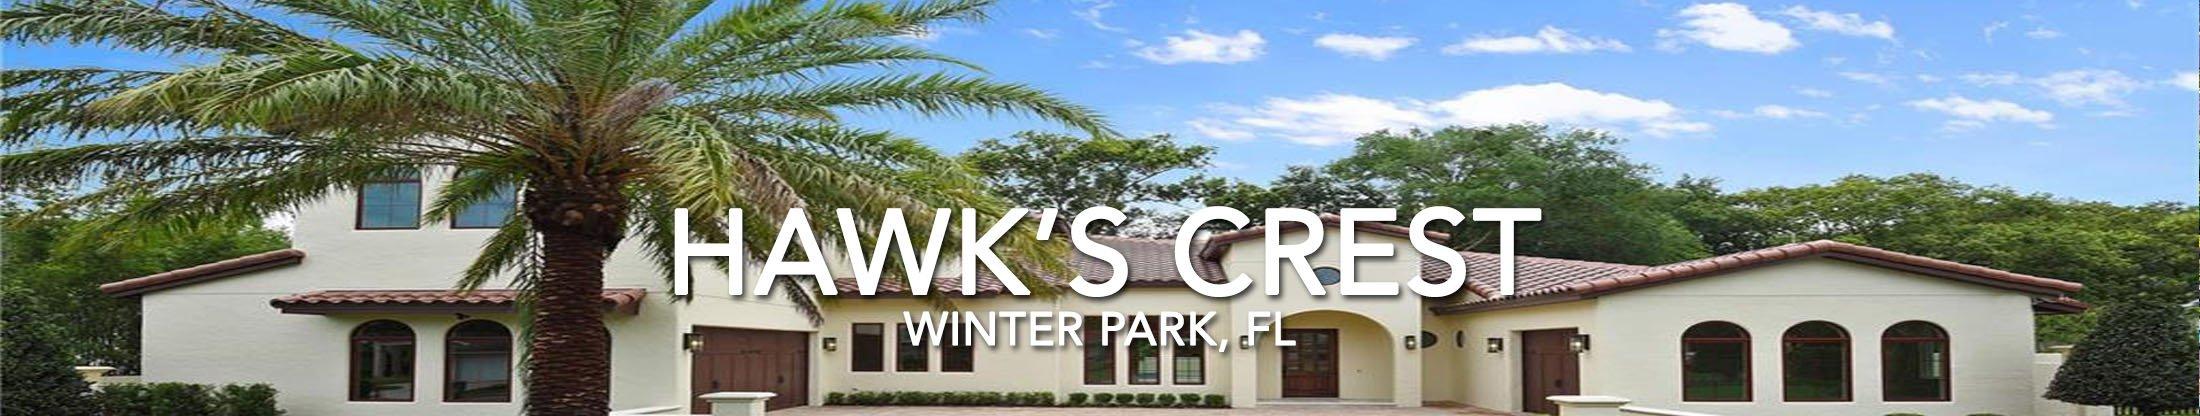 Hawk's Crest - Winter Park - FL